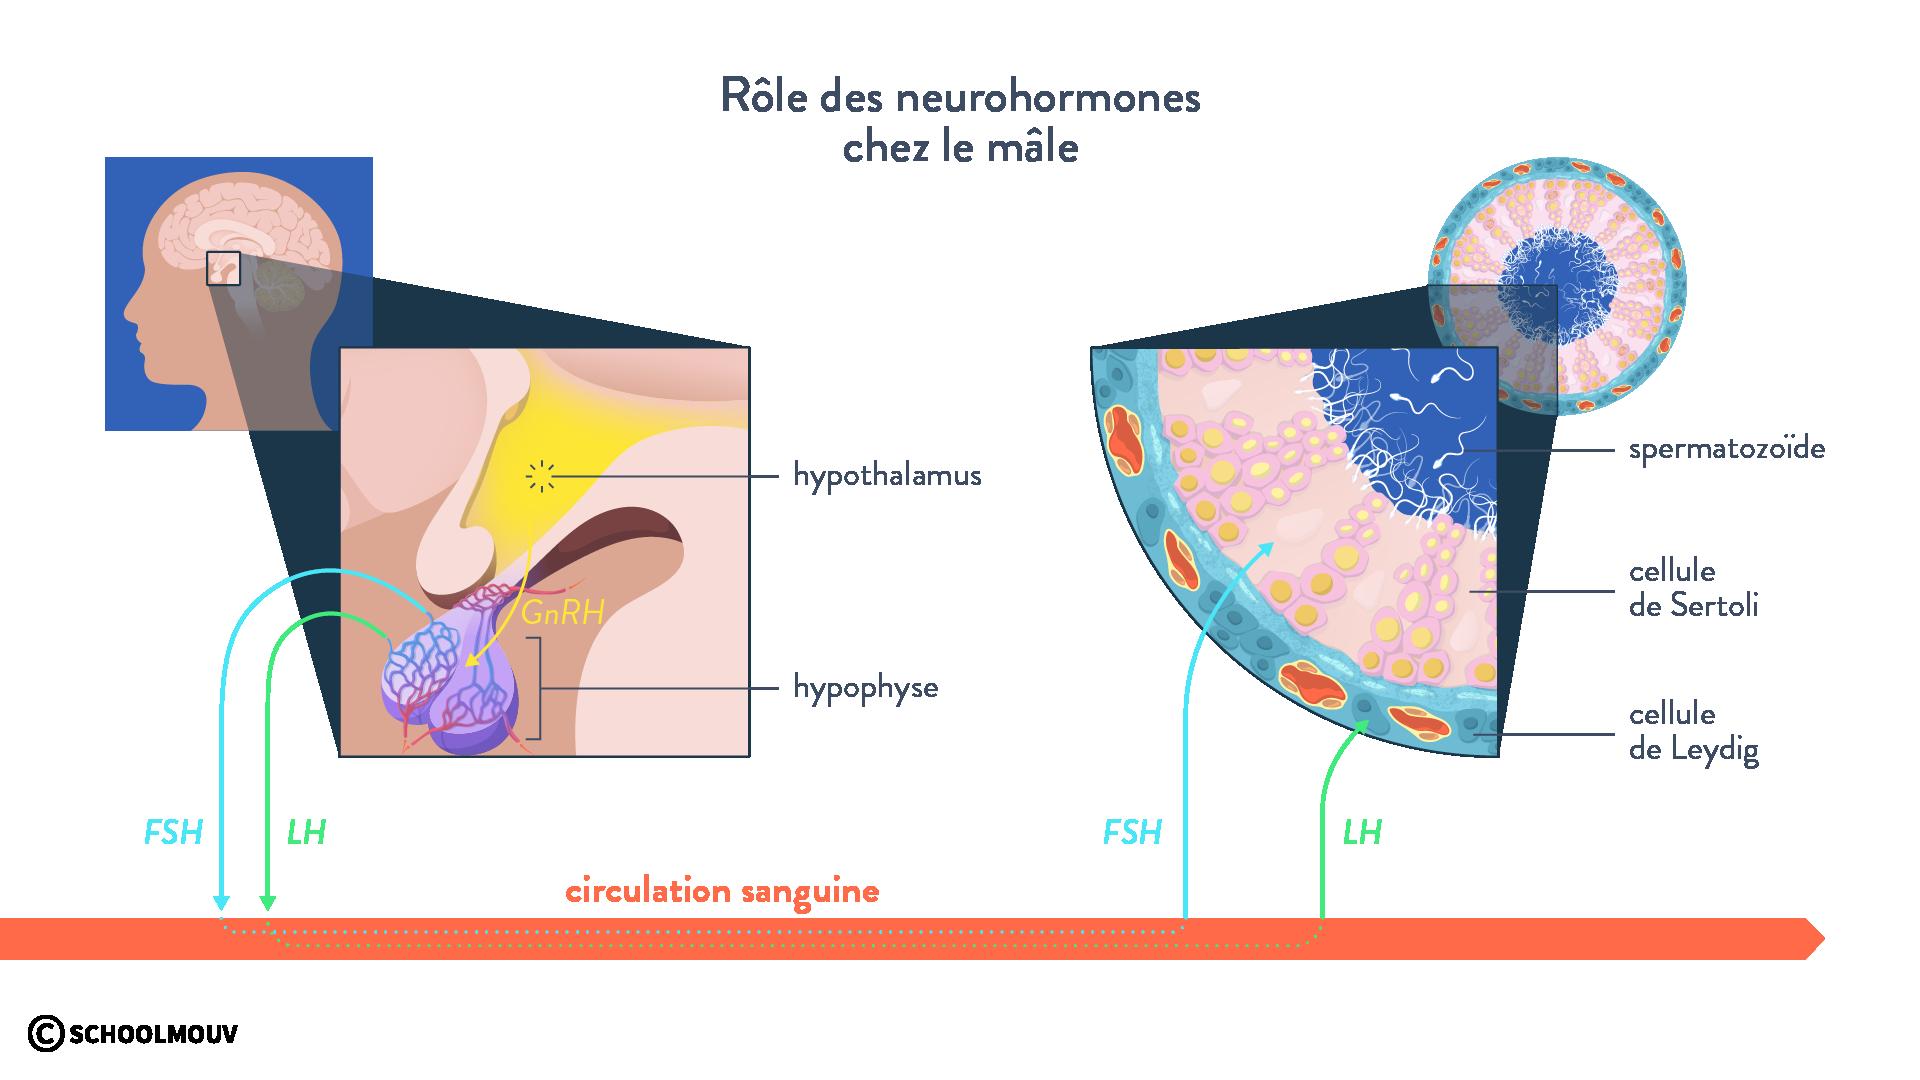 neurohormones FSH LH hypophyse hypothalamus